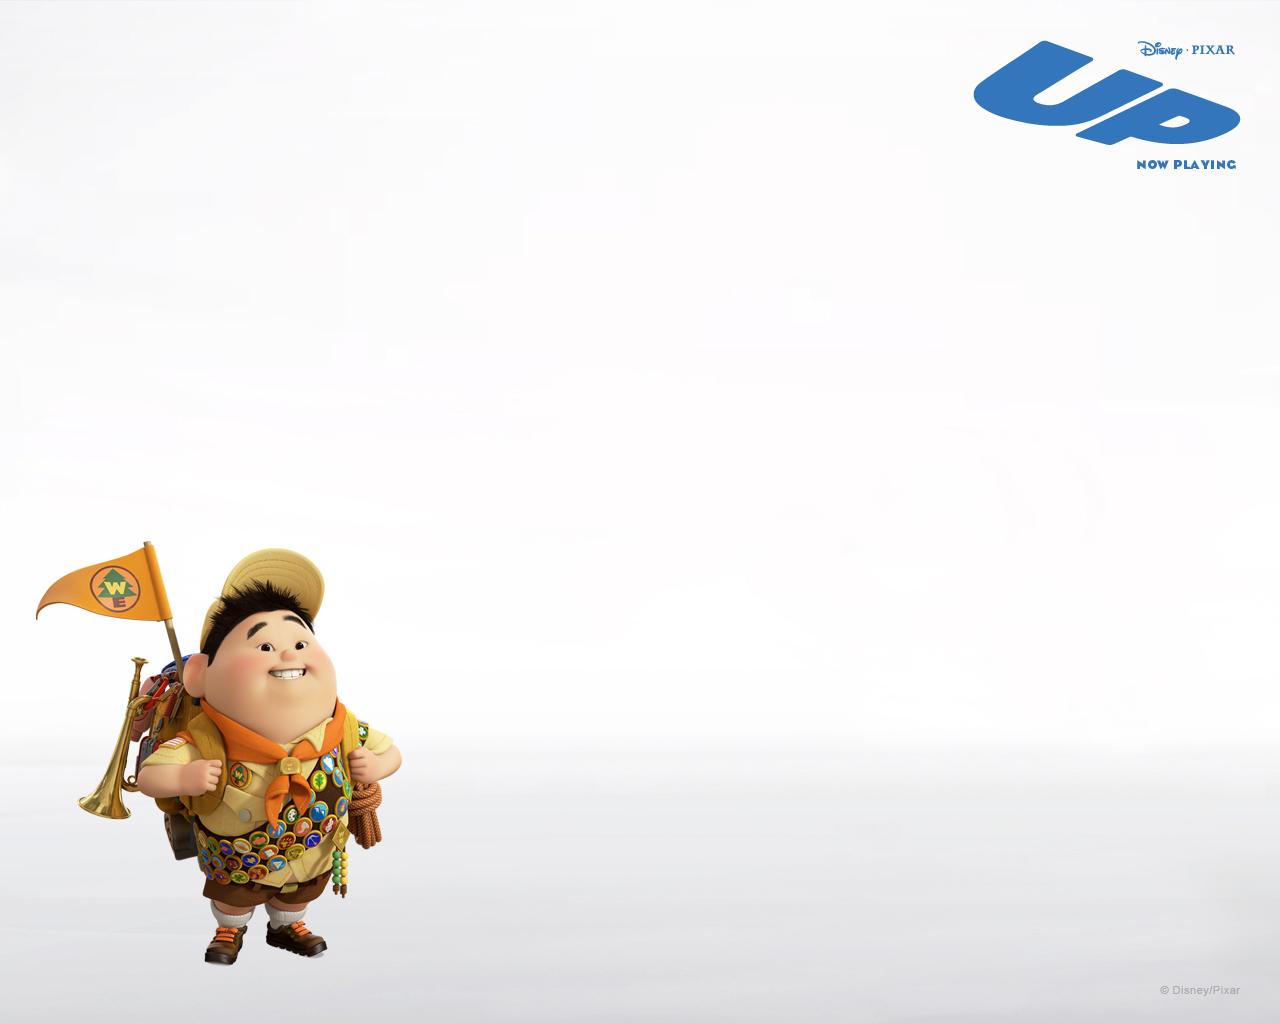 Disney Pixar Up Wallpapers Poster Movie Wallpaper 1280x1024